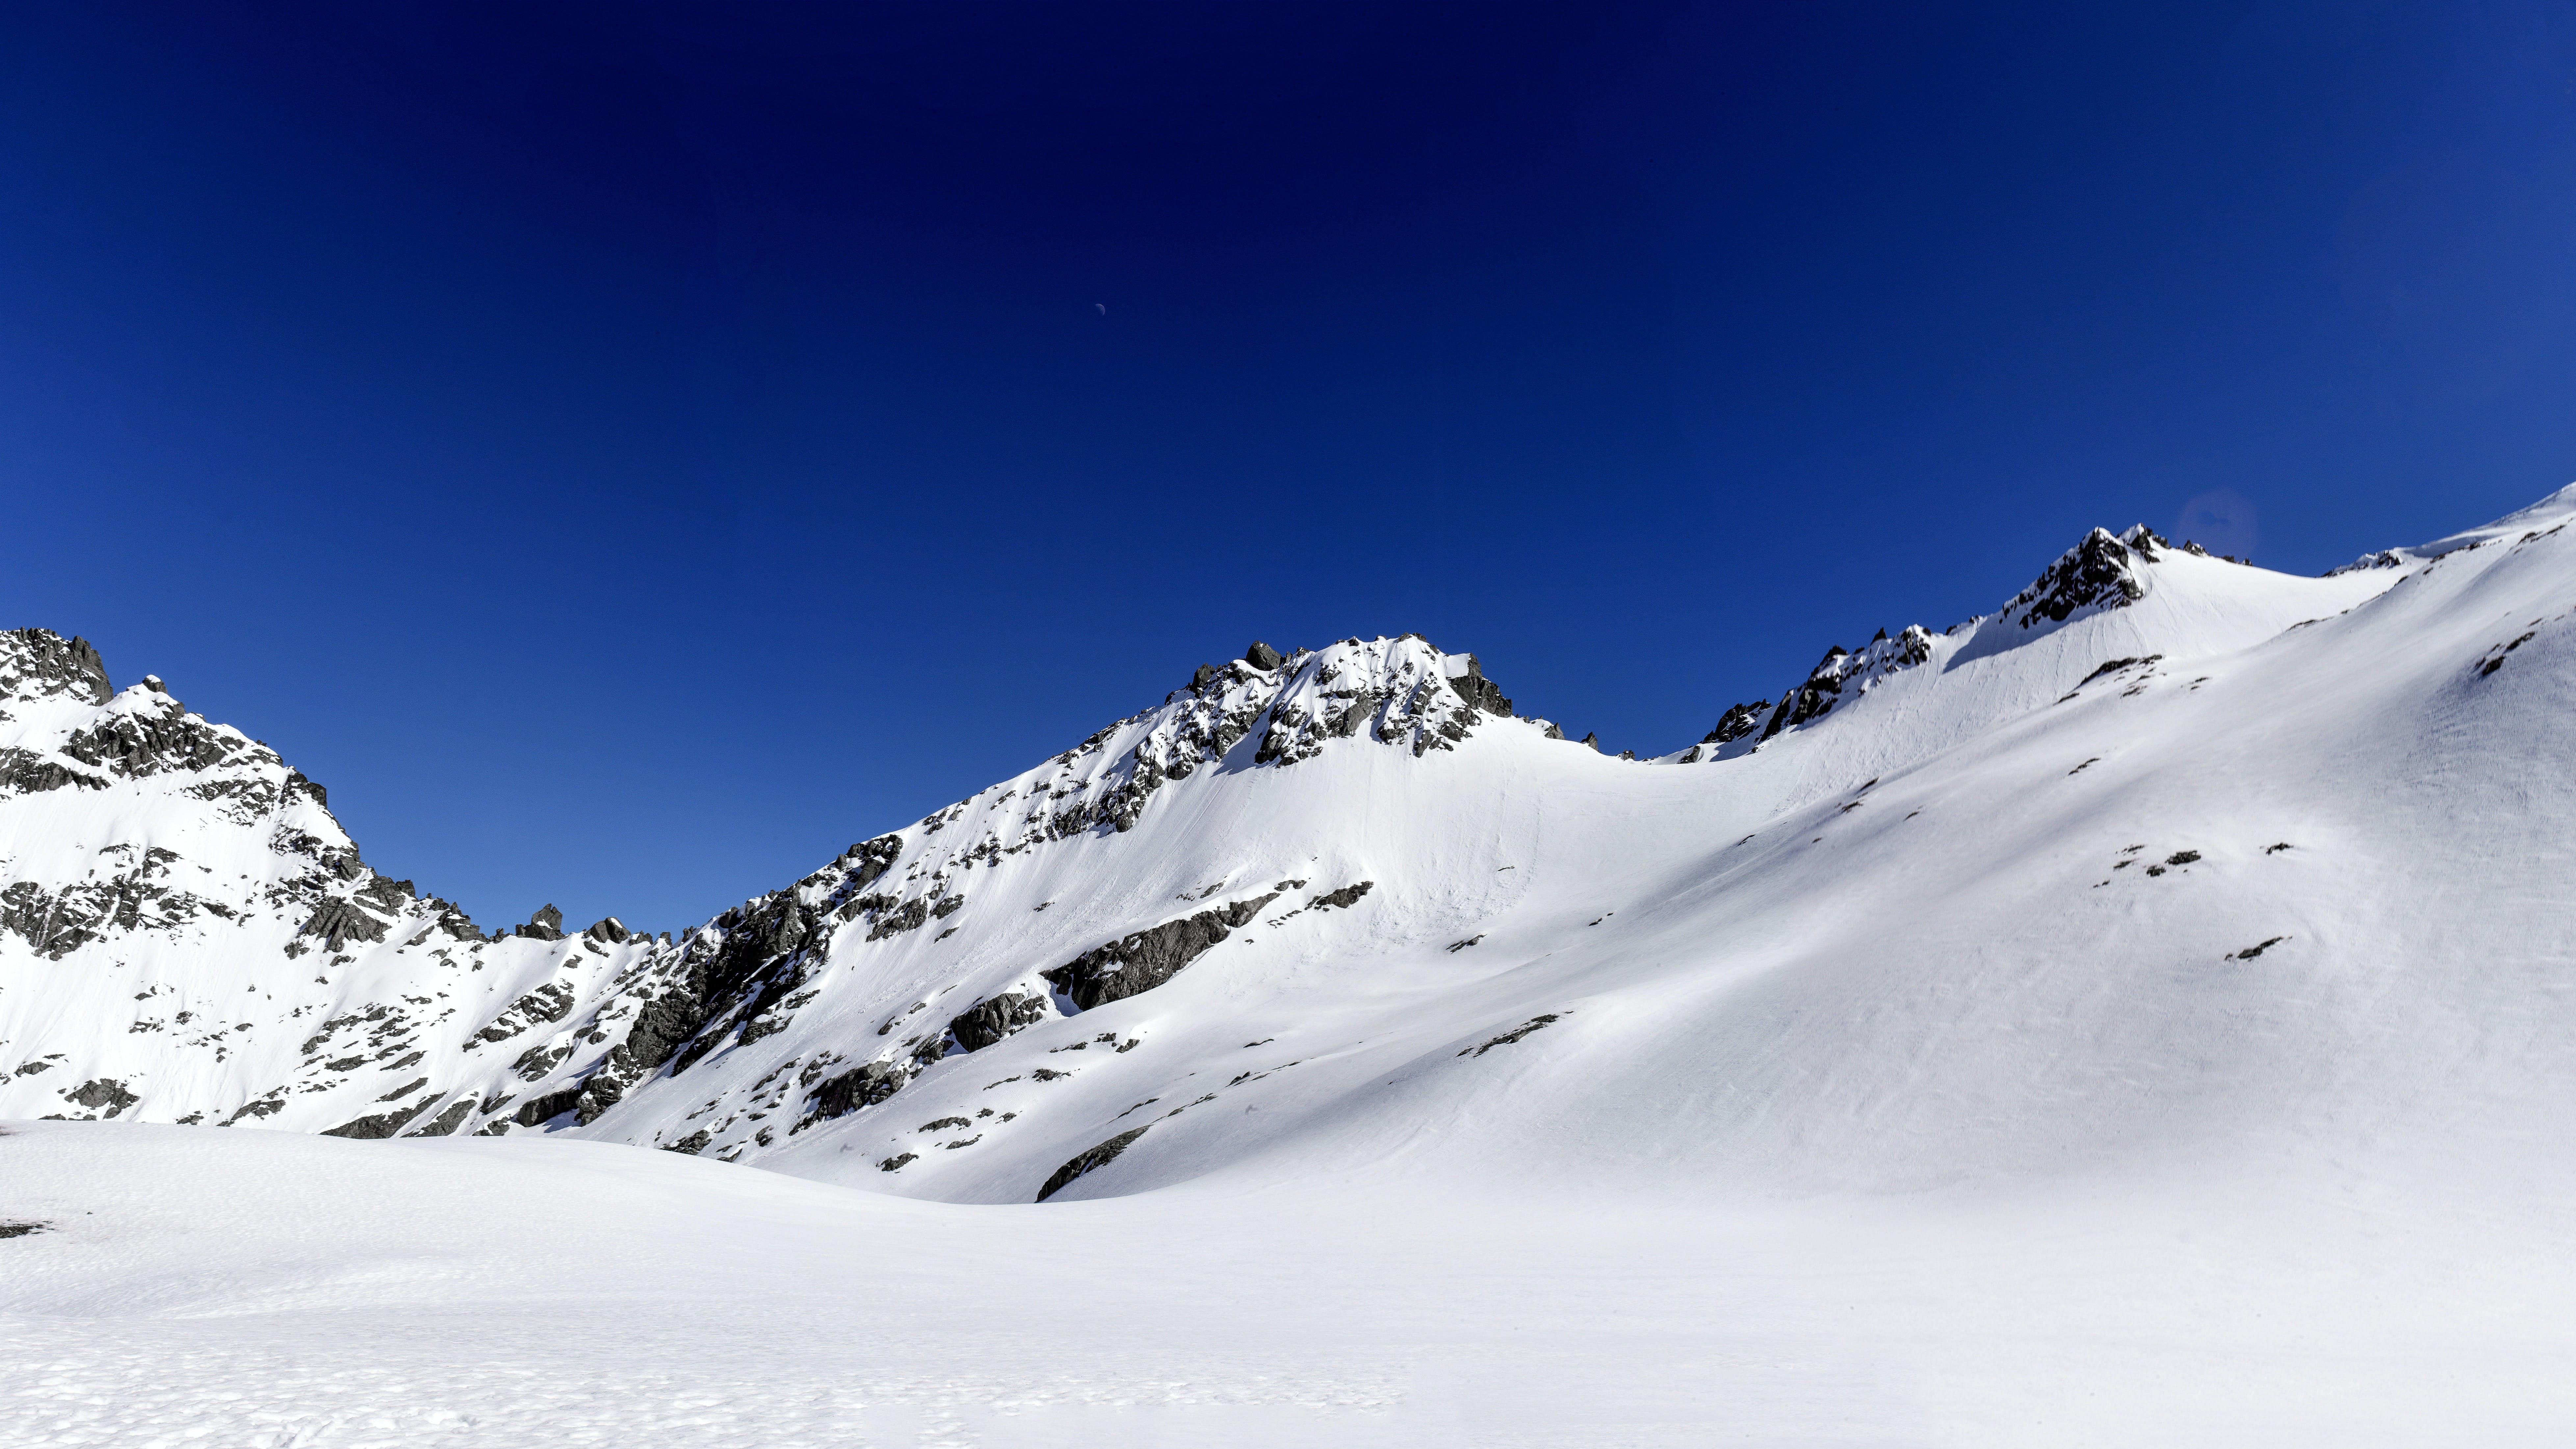 Skiing In New Zealand Best Nz Ski Resorts To Visit